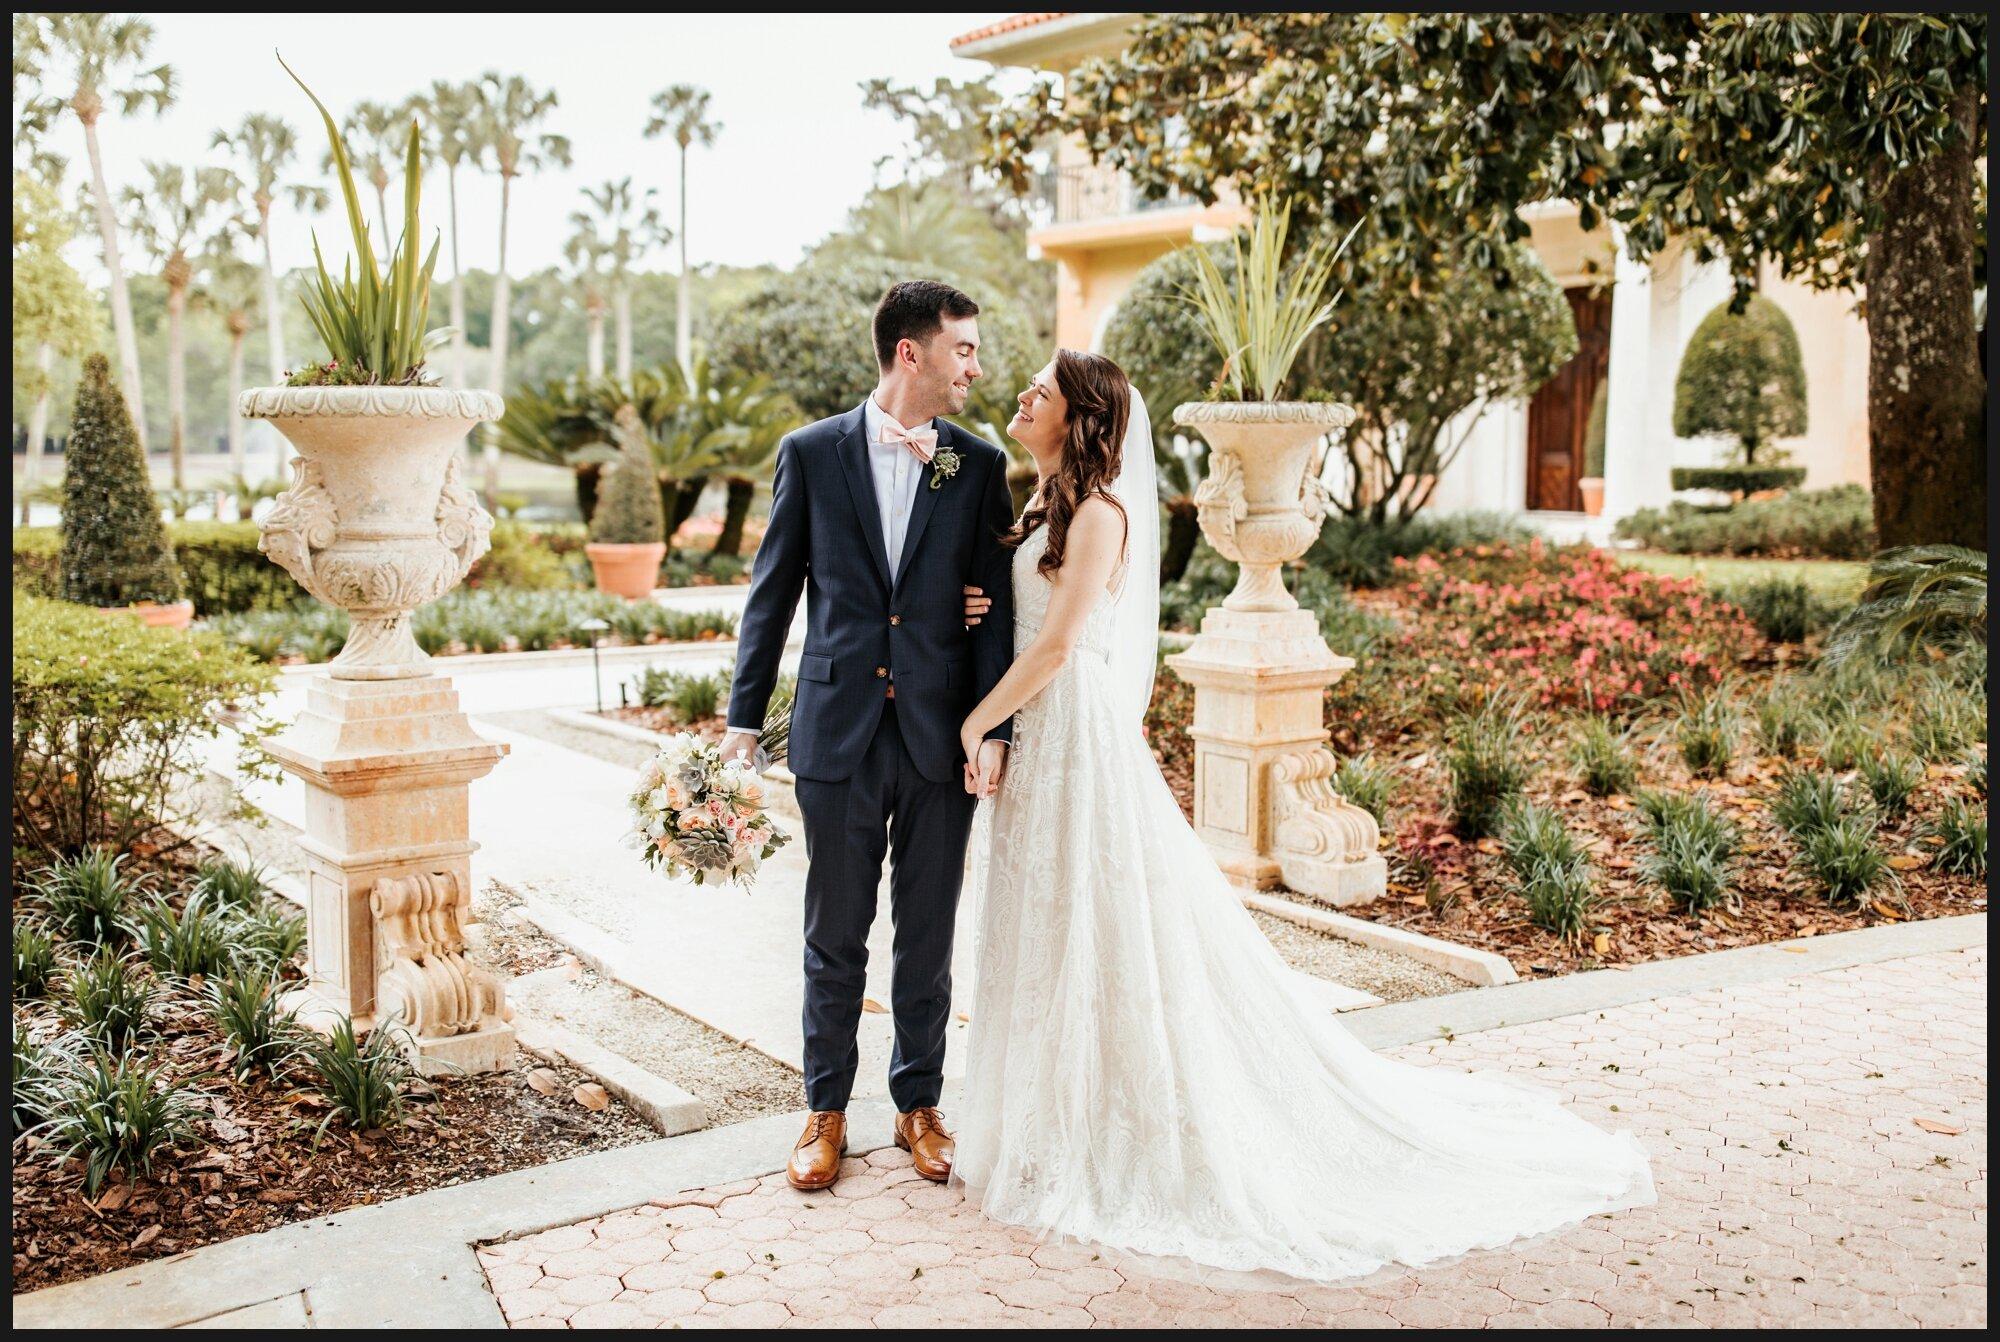 Orlando-Wedding-Photographer-destination-wedding-photographer-florida-wedding-photographer-hawaii-wedding-photographer_0668.jpg